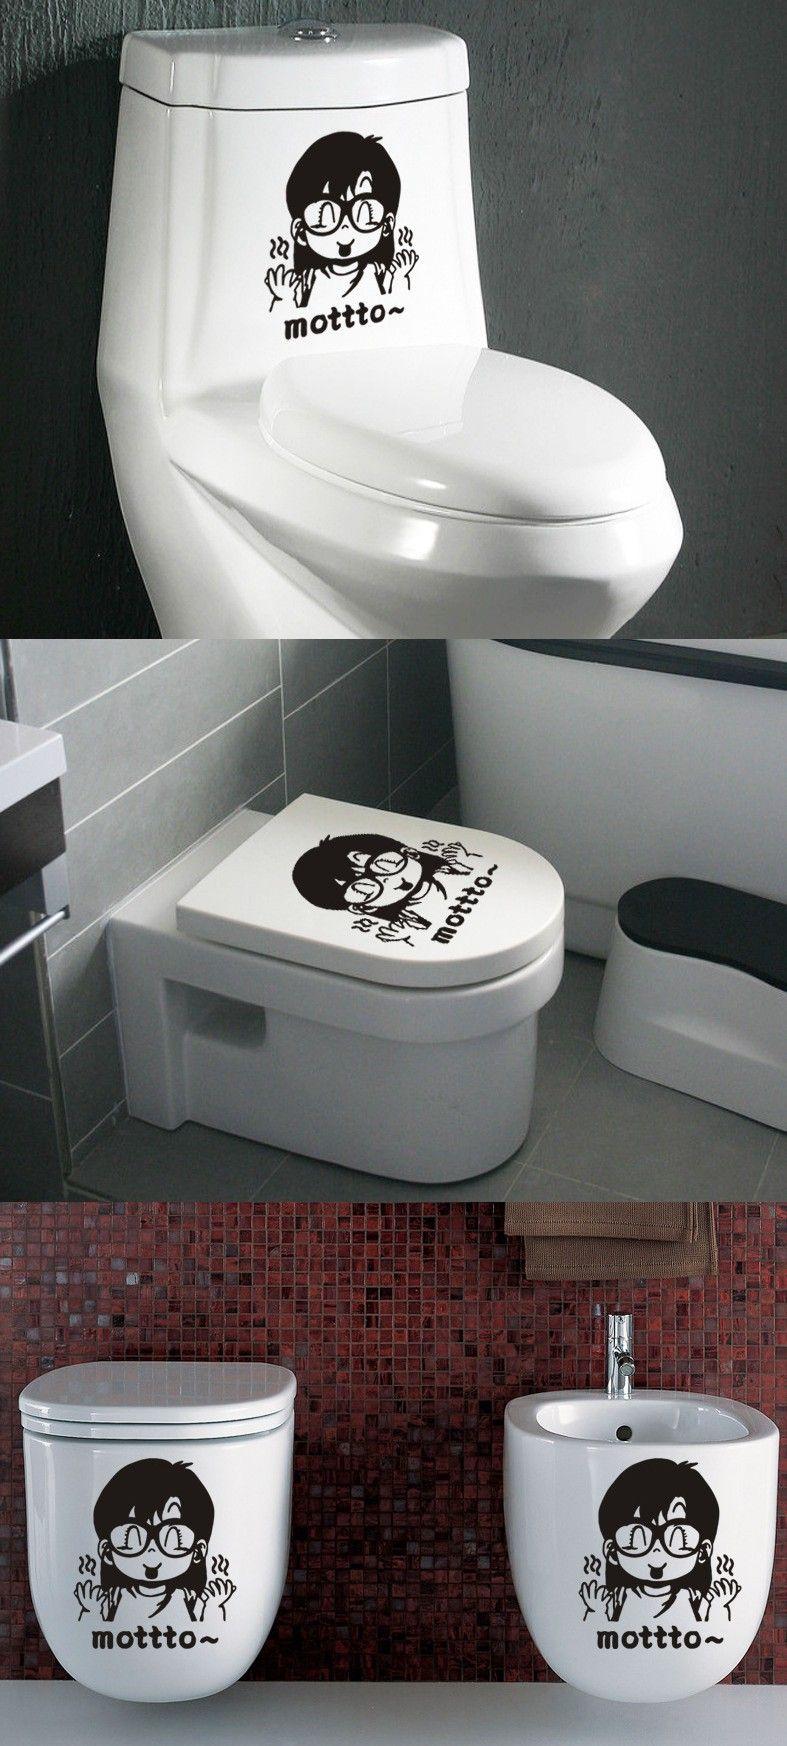 M1-11 fashion cute glasses girl toilet sticker removable PVC Scrubs transparent factory direct home decoration $2.99